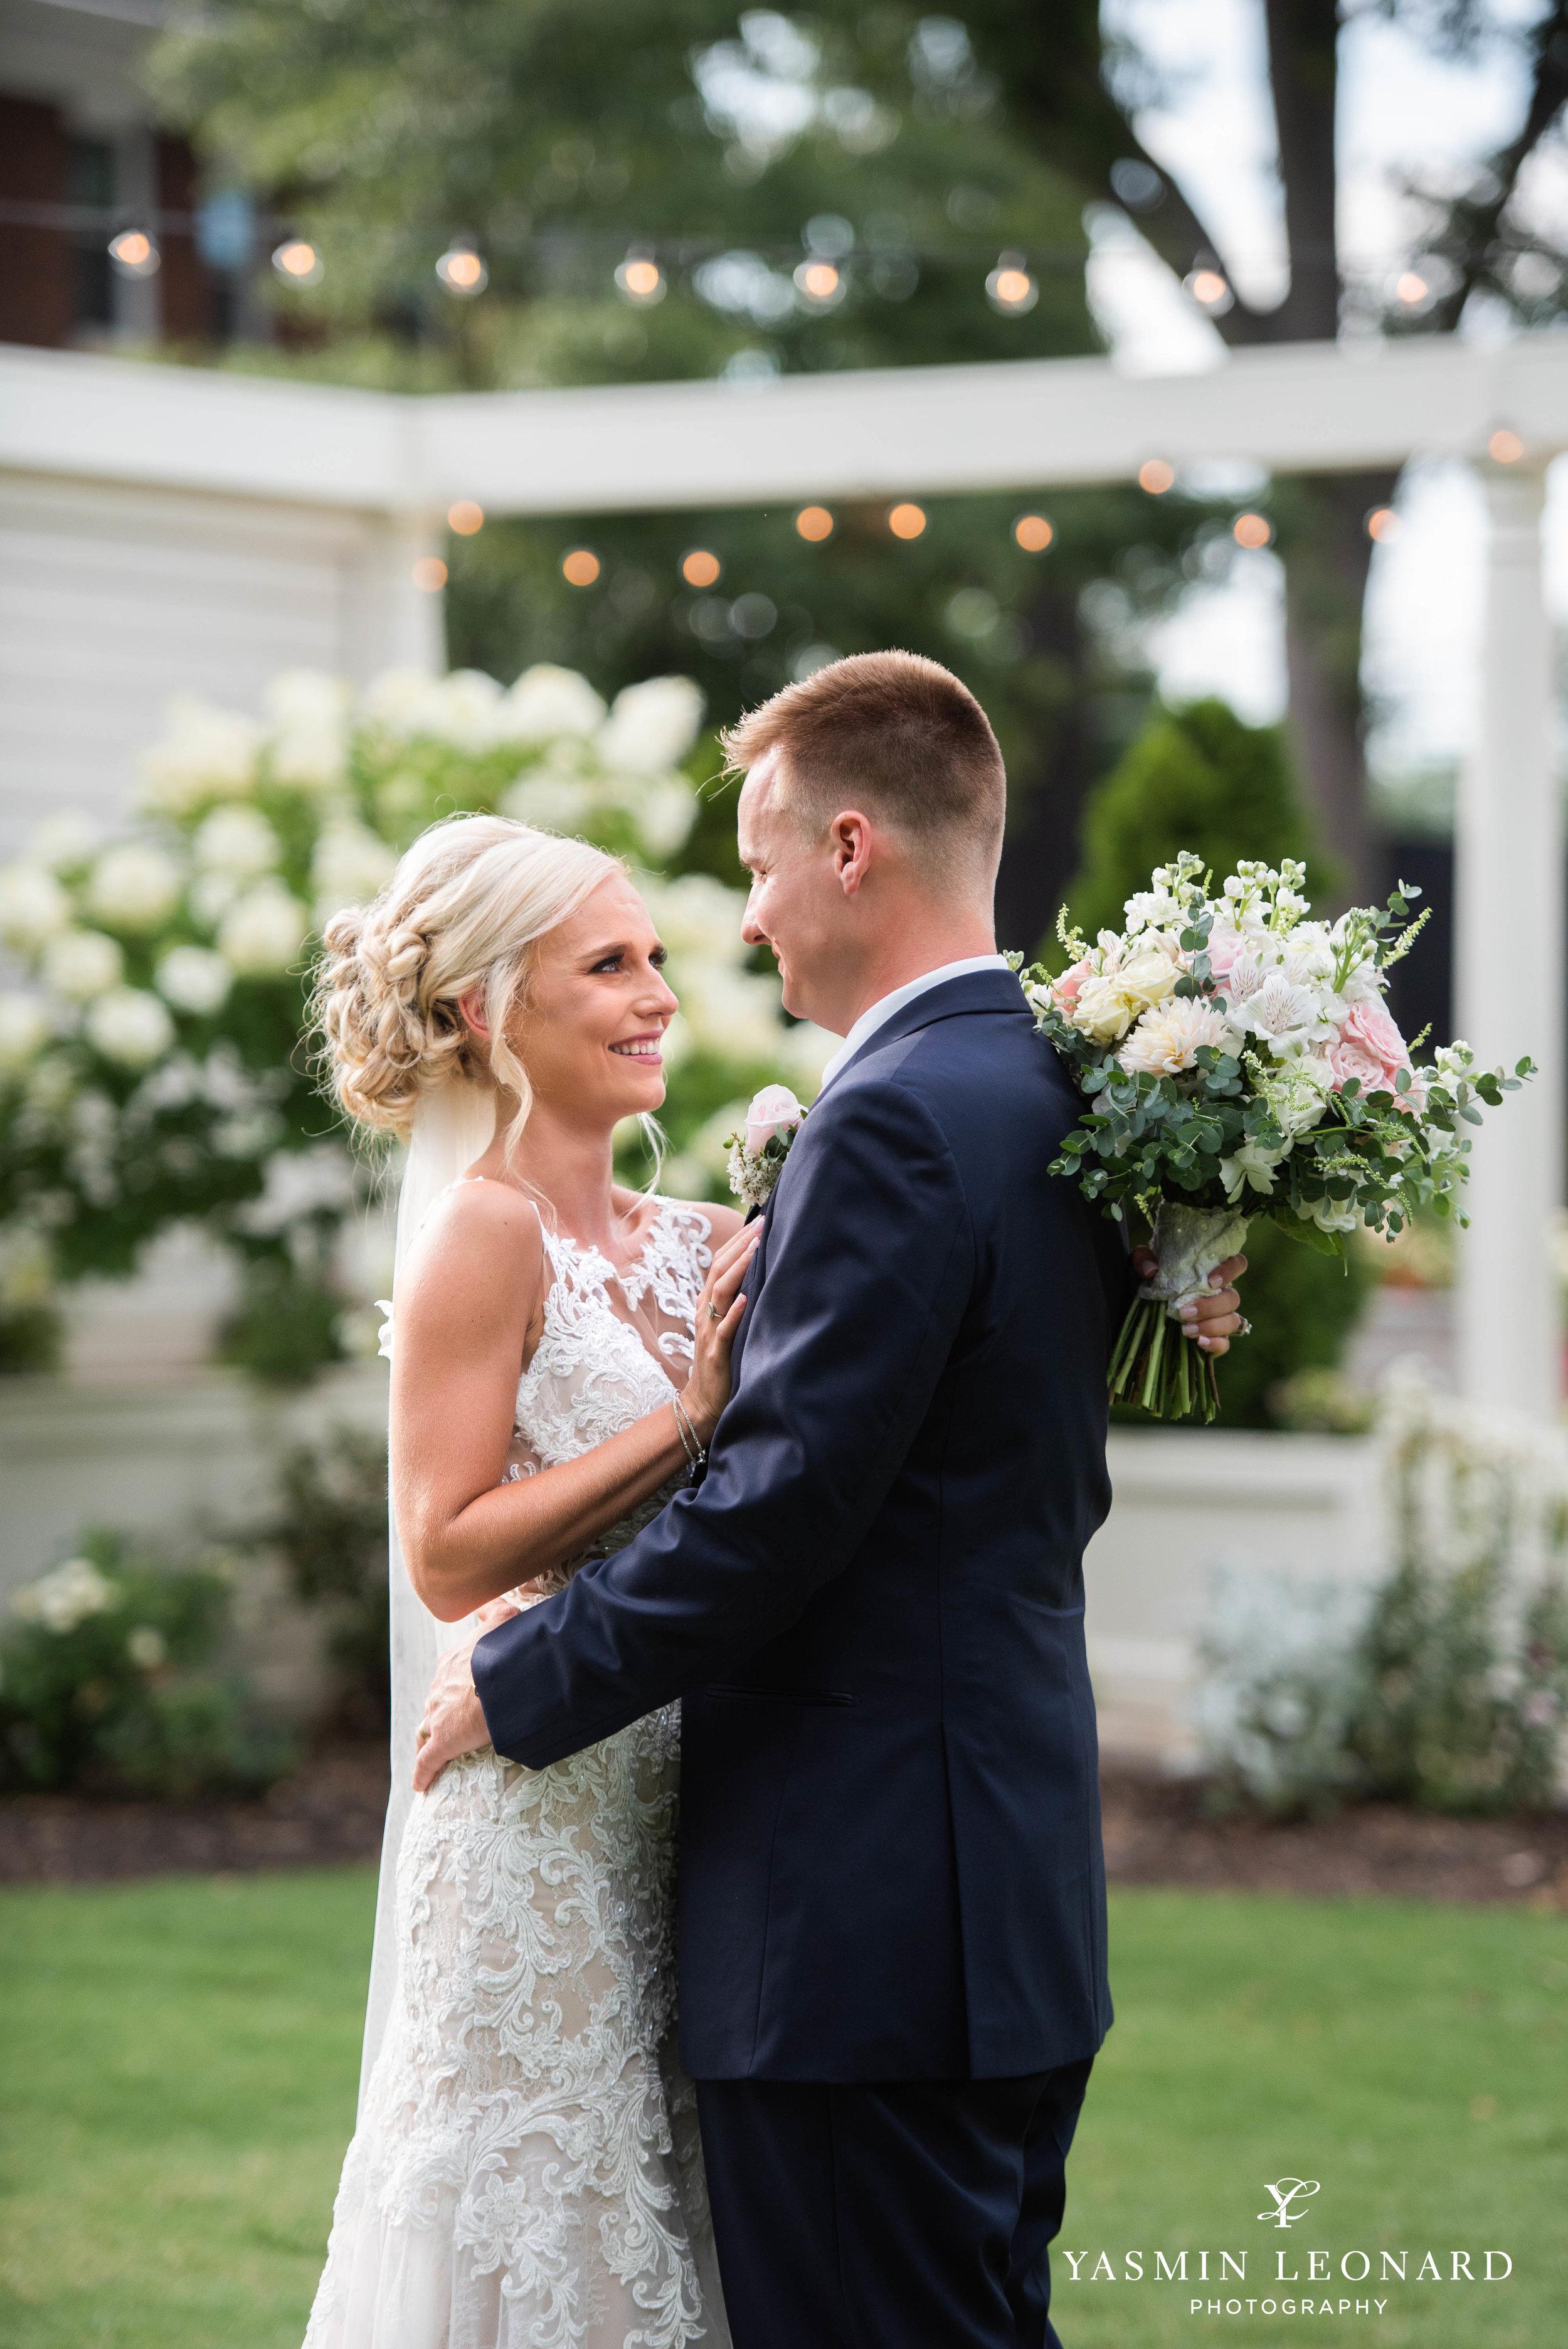 Separk Mansion - NC Weddings - Gastonia Wedding - NC Wedding Venues - Pink and Blue Wedding Ideas - Pink Bridesmaid Dresses - Yasmin Leonard Photography-29.jpg